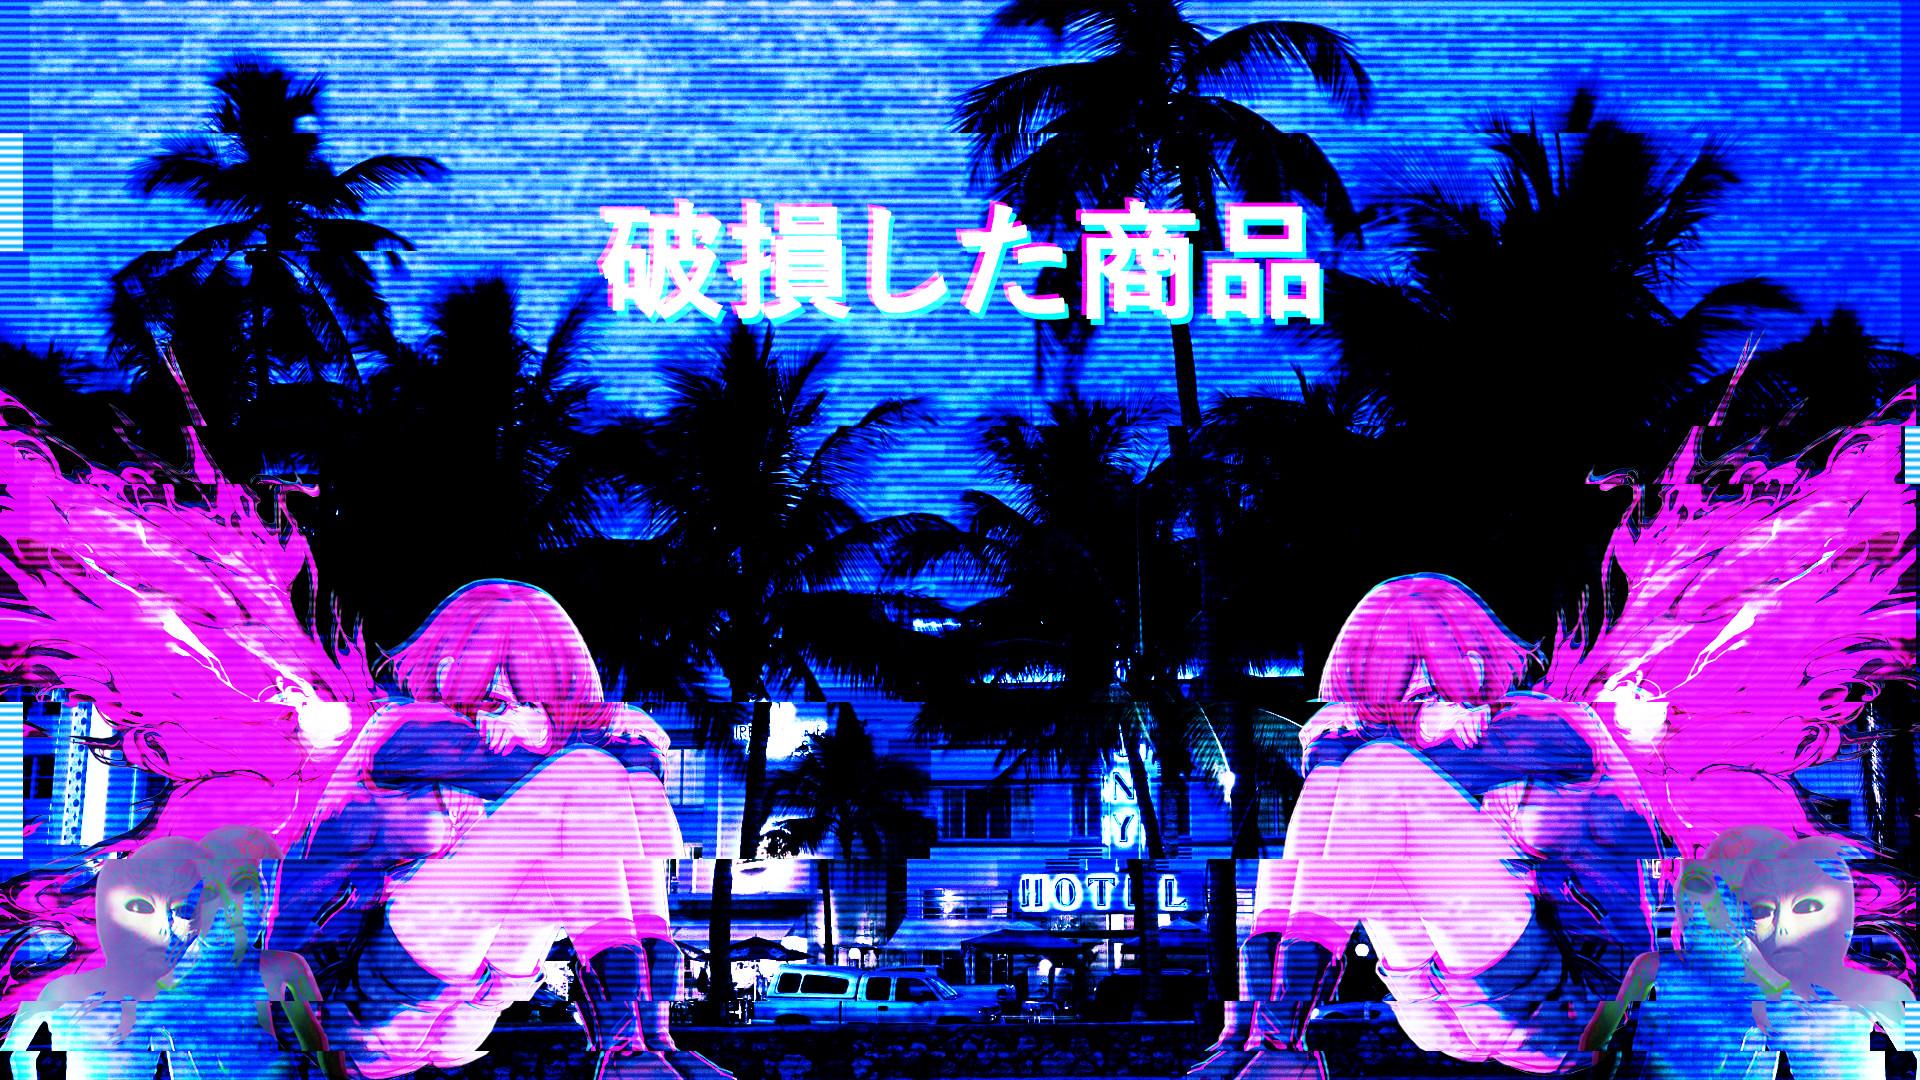 anime aesthetic wallpaper iphone anime radius